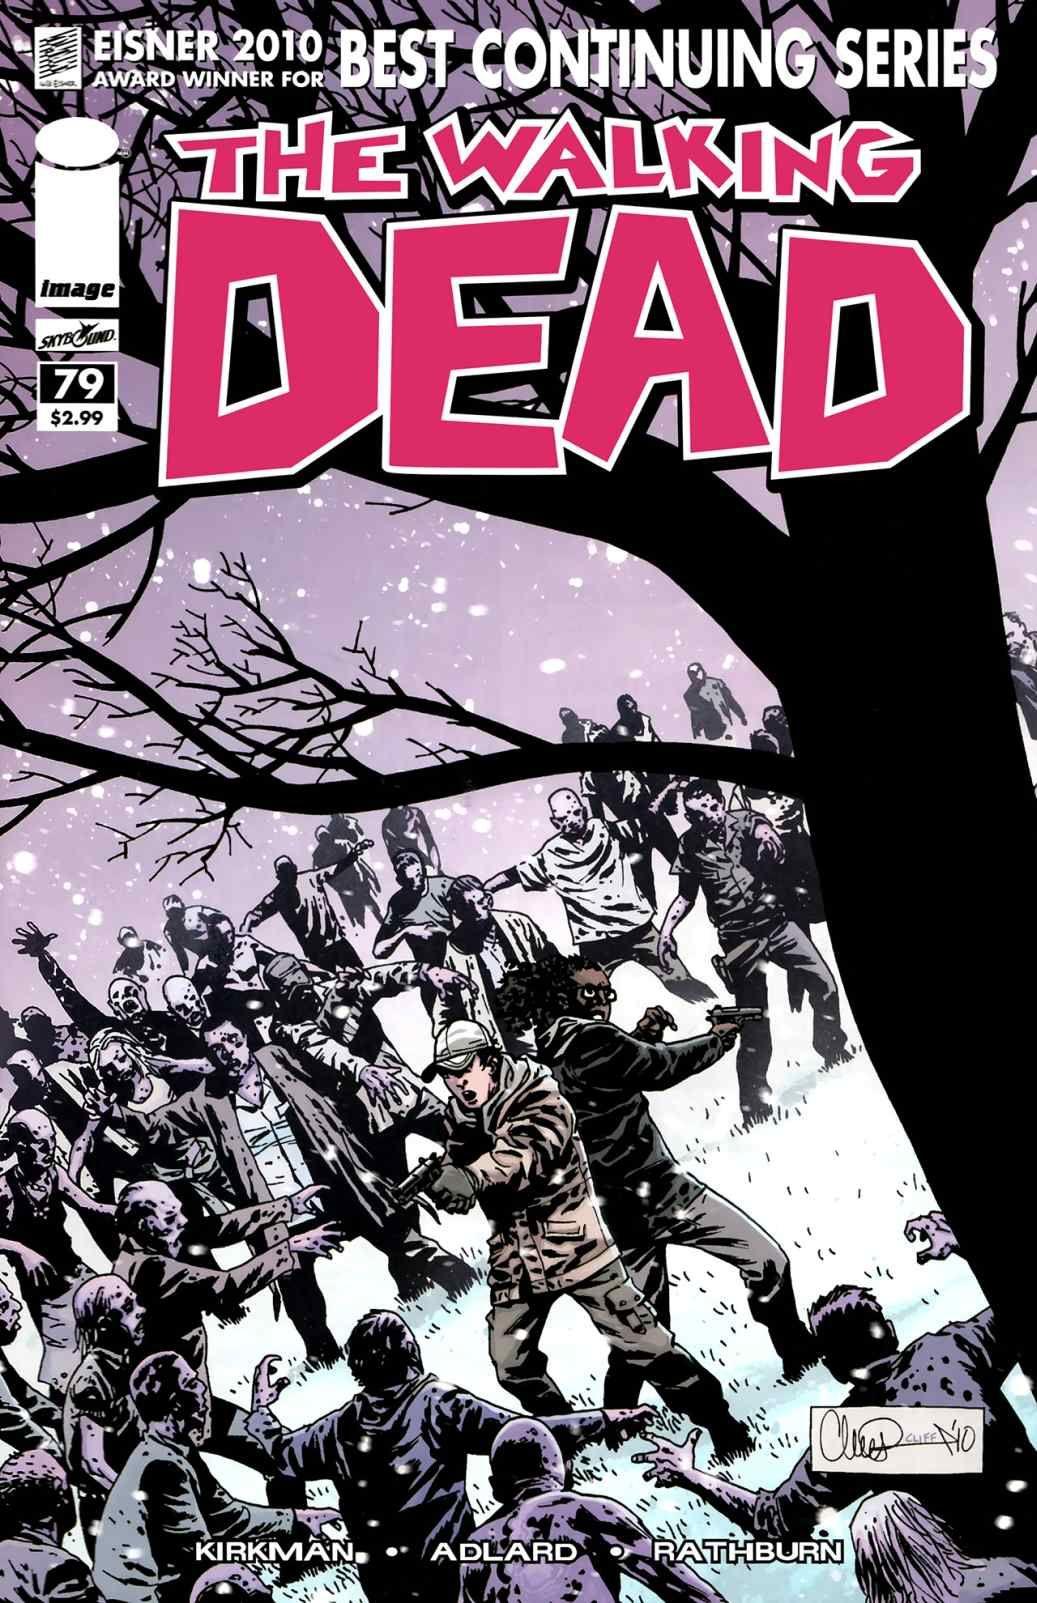 Read Comics Online Free - The Walking Dead - Chapter 079